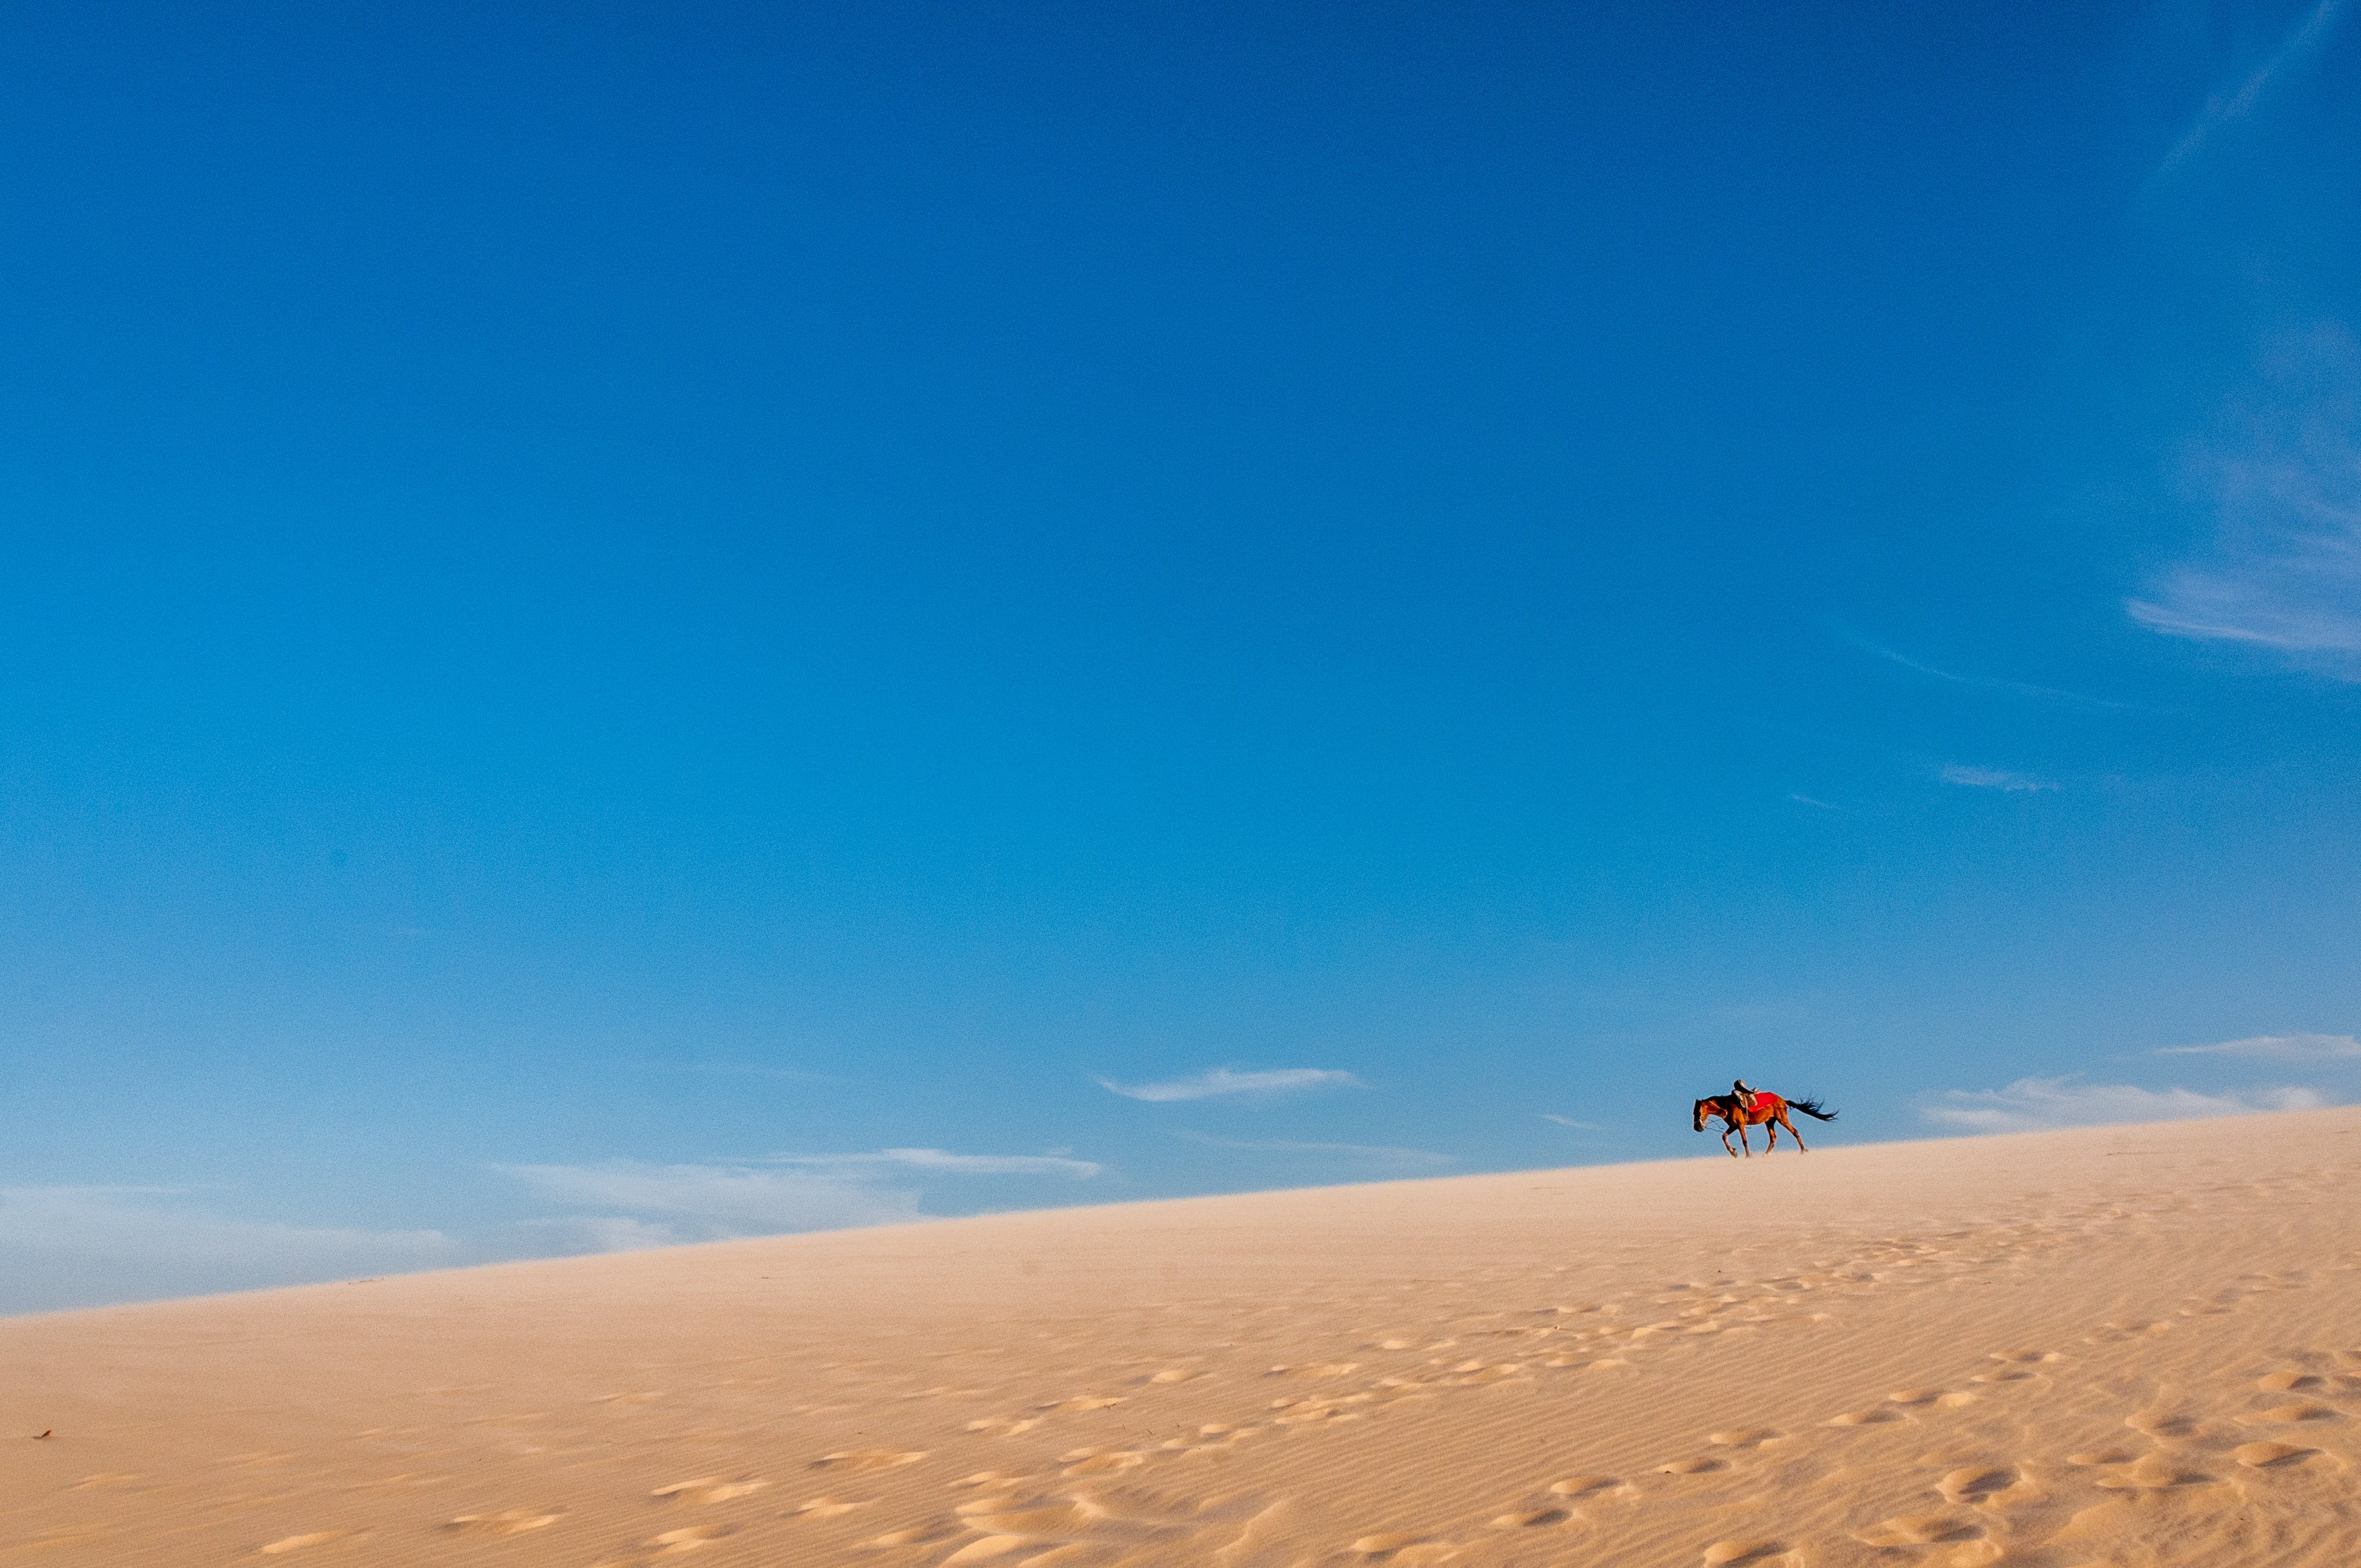 Kostenloses Stock Foto zu düne, pferd, sandstrand